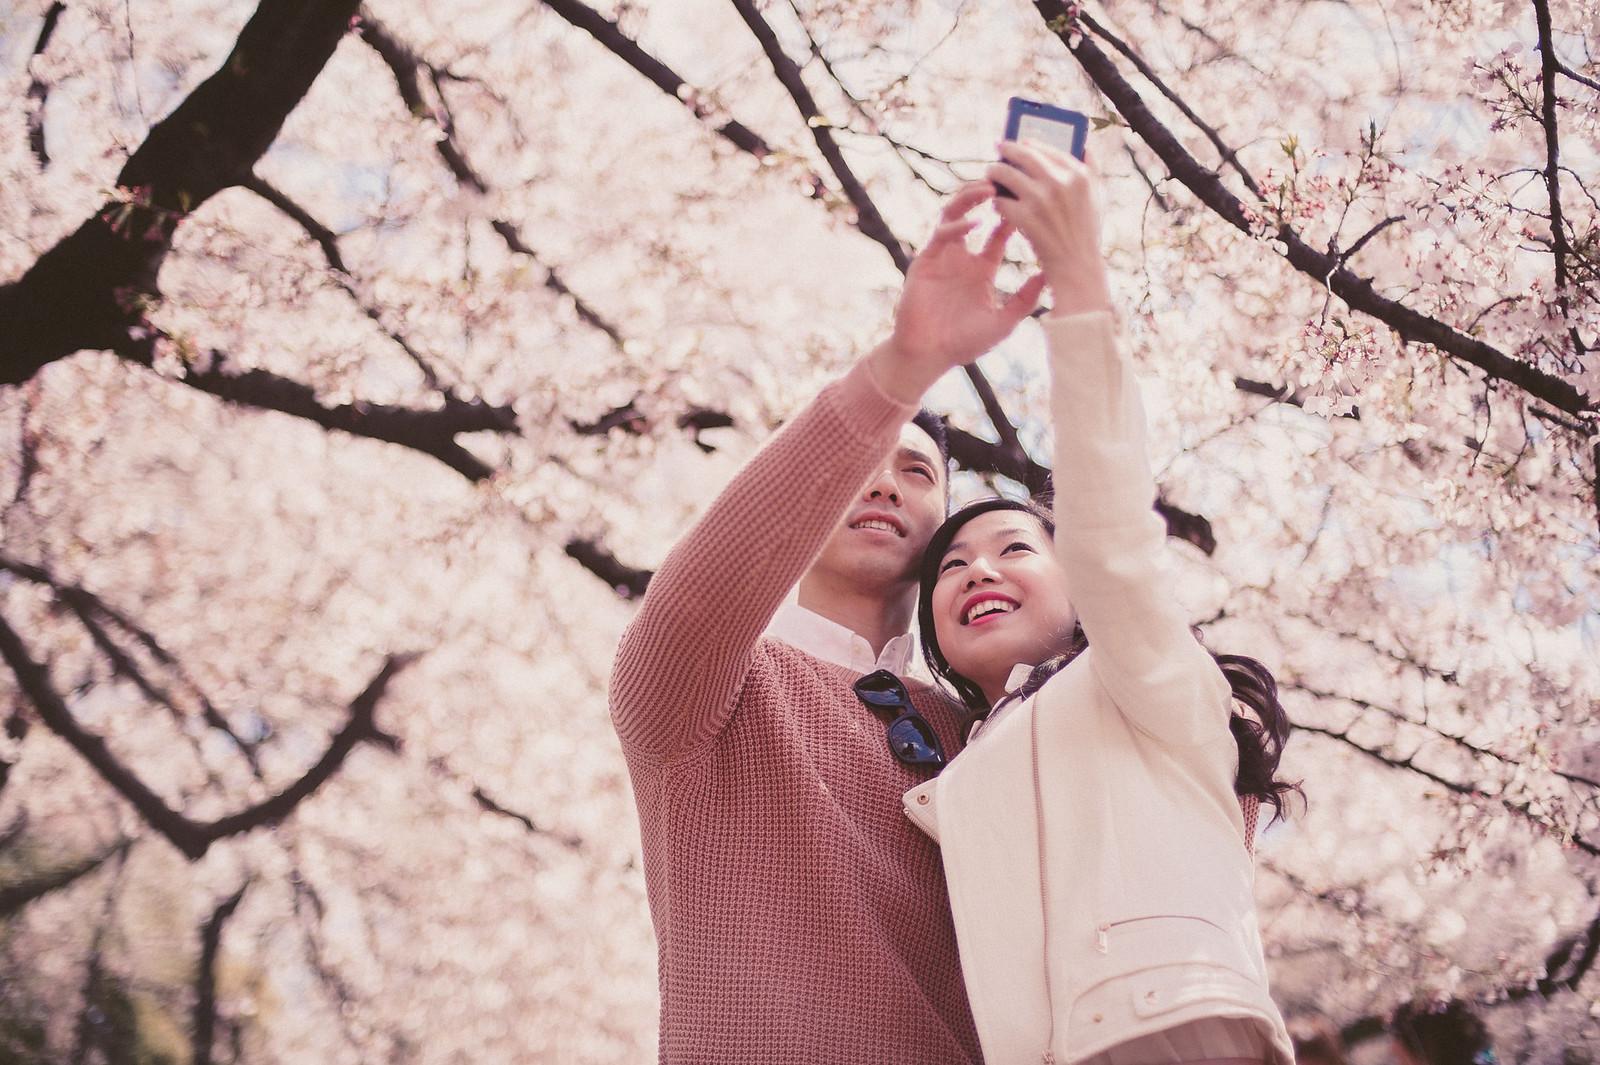 Jakarta, Multifolds, overseas pre wedding, Tokyo, Ines and Irjen, Sakura, cherry blossom, Japan, lovescapade